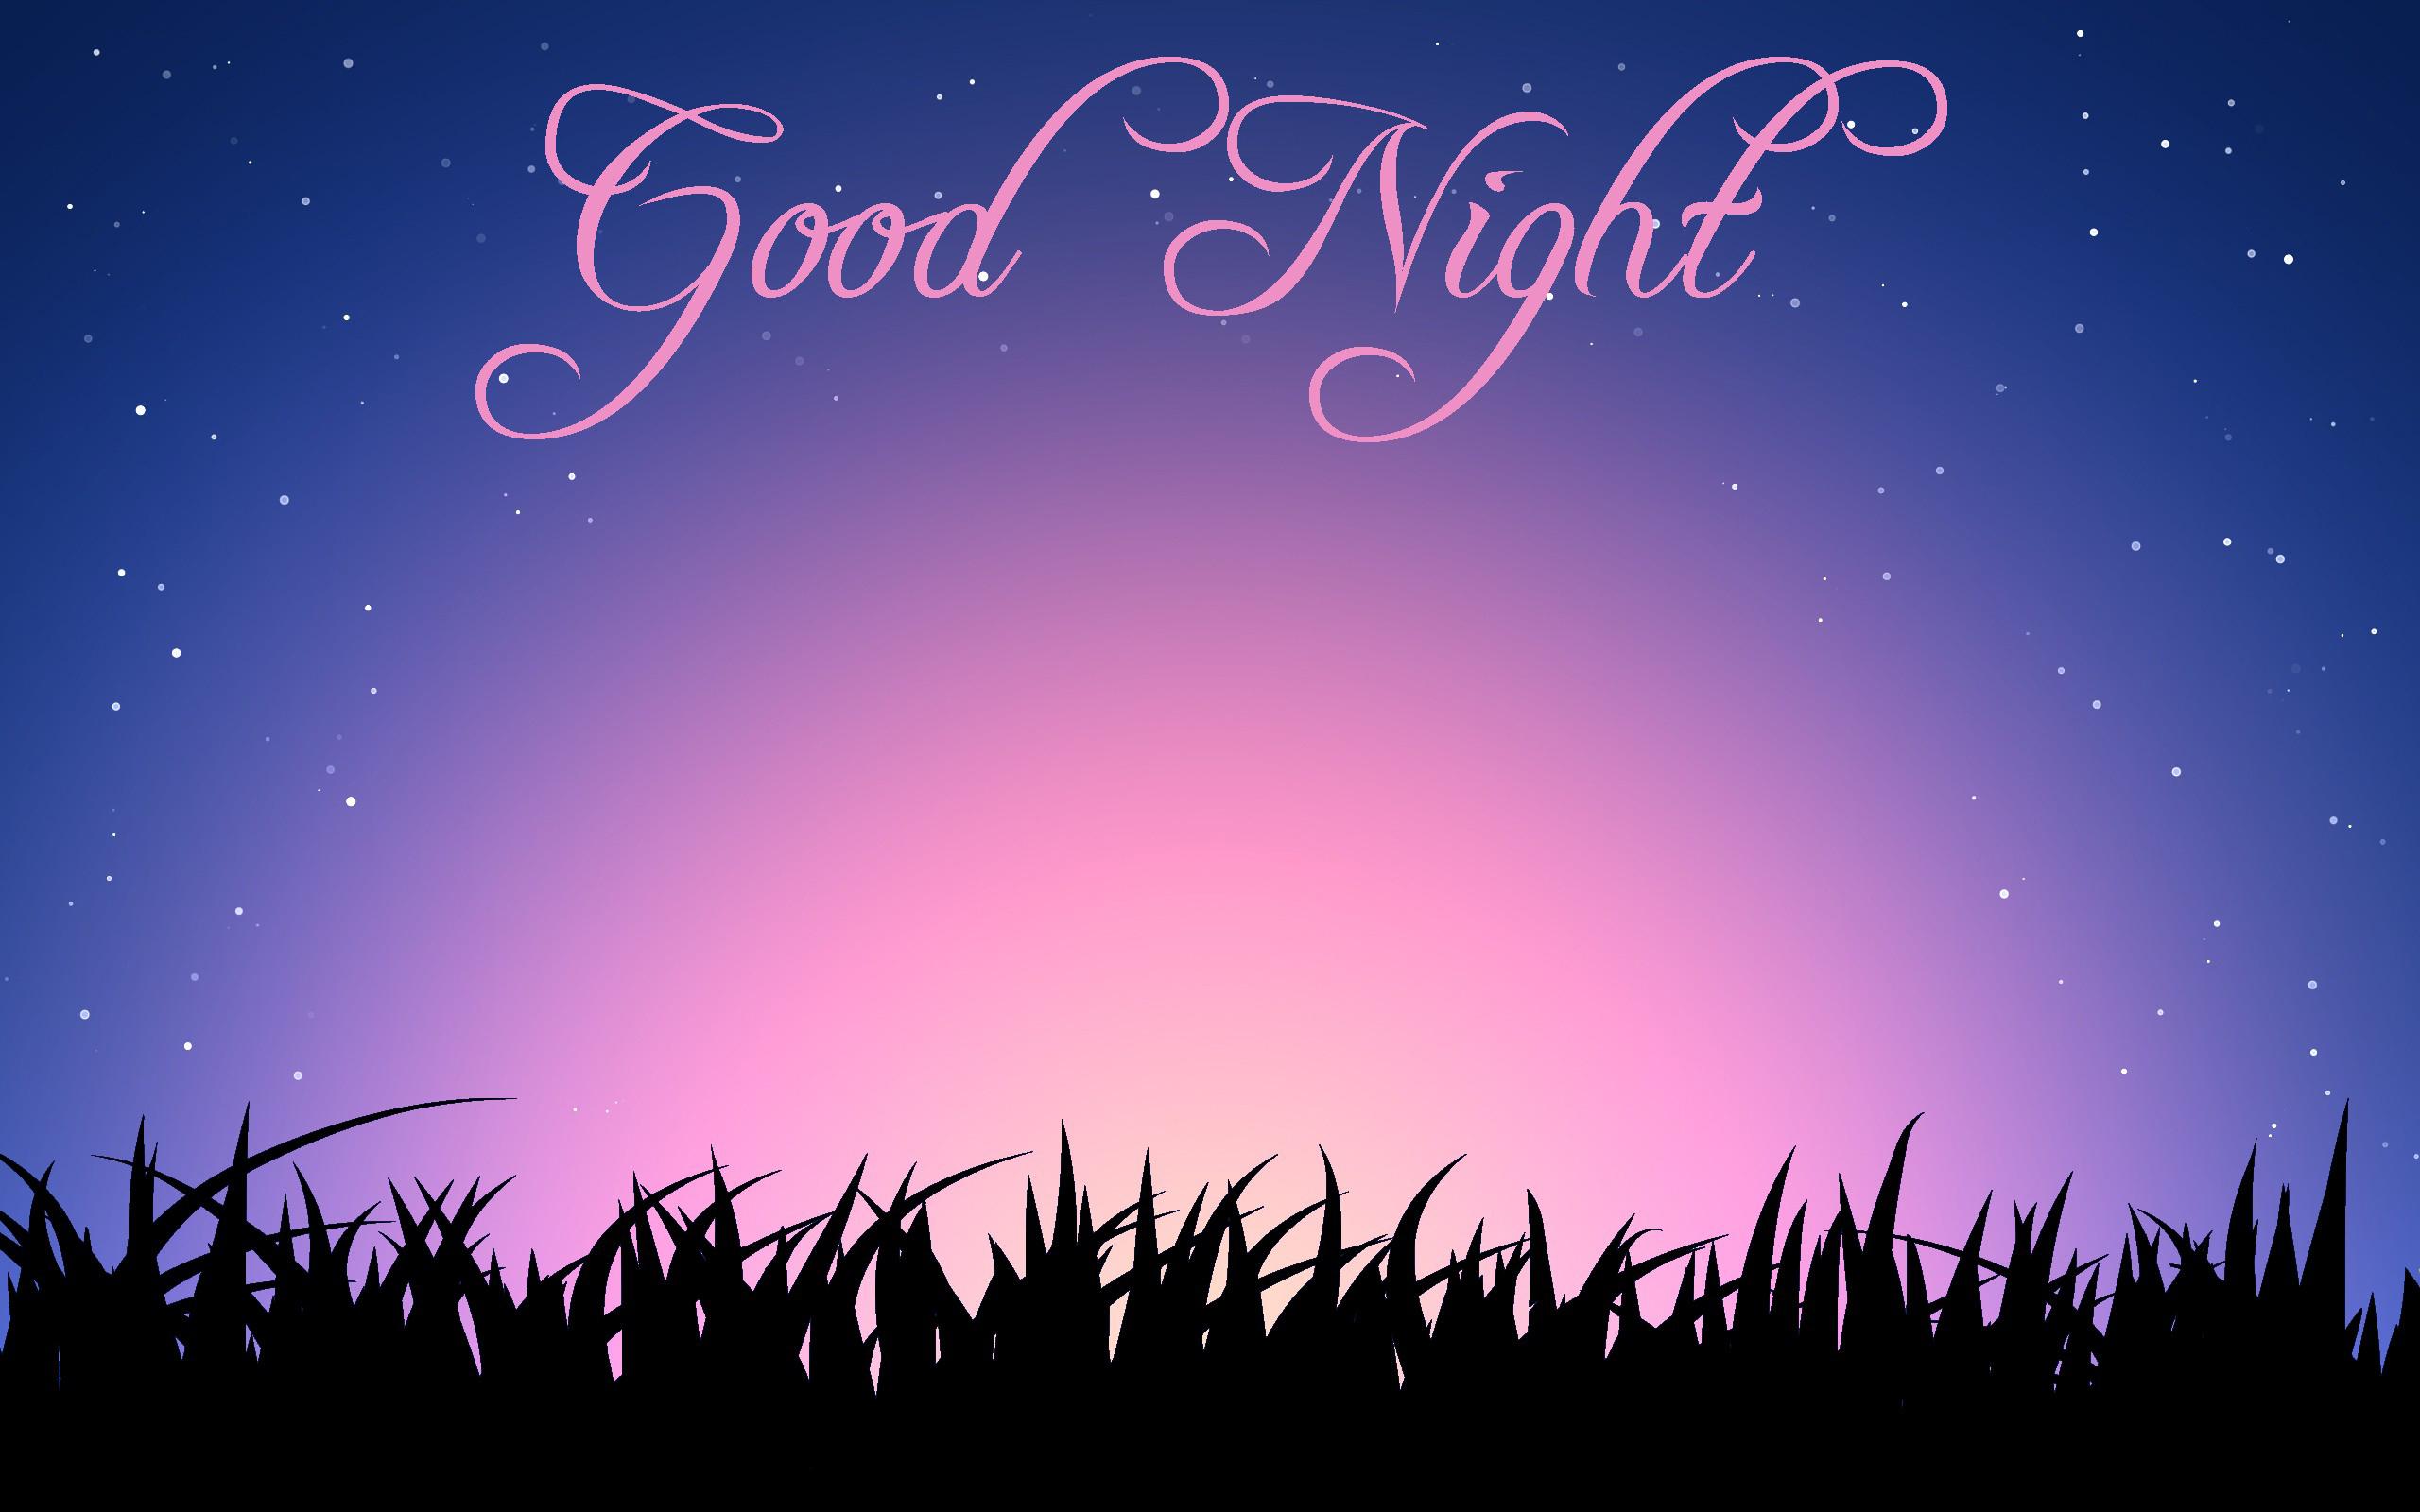 Good Night Wallpapers Good Night Wallpapers Good Night Wallpapers 2560x1600